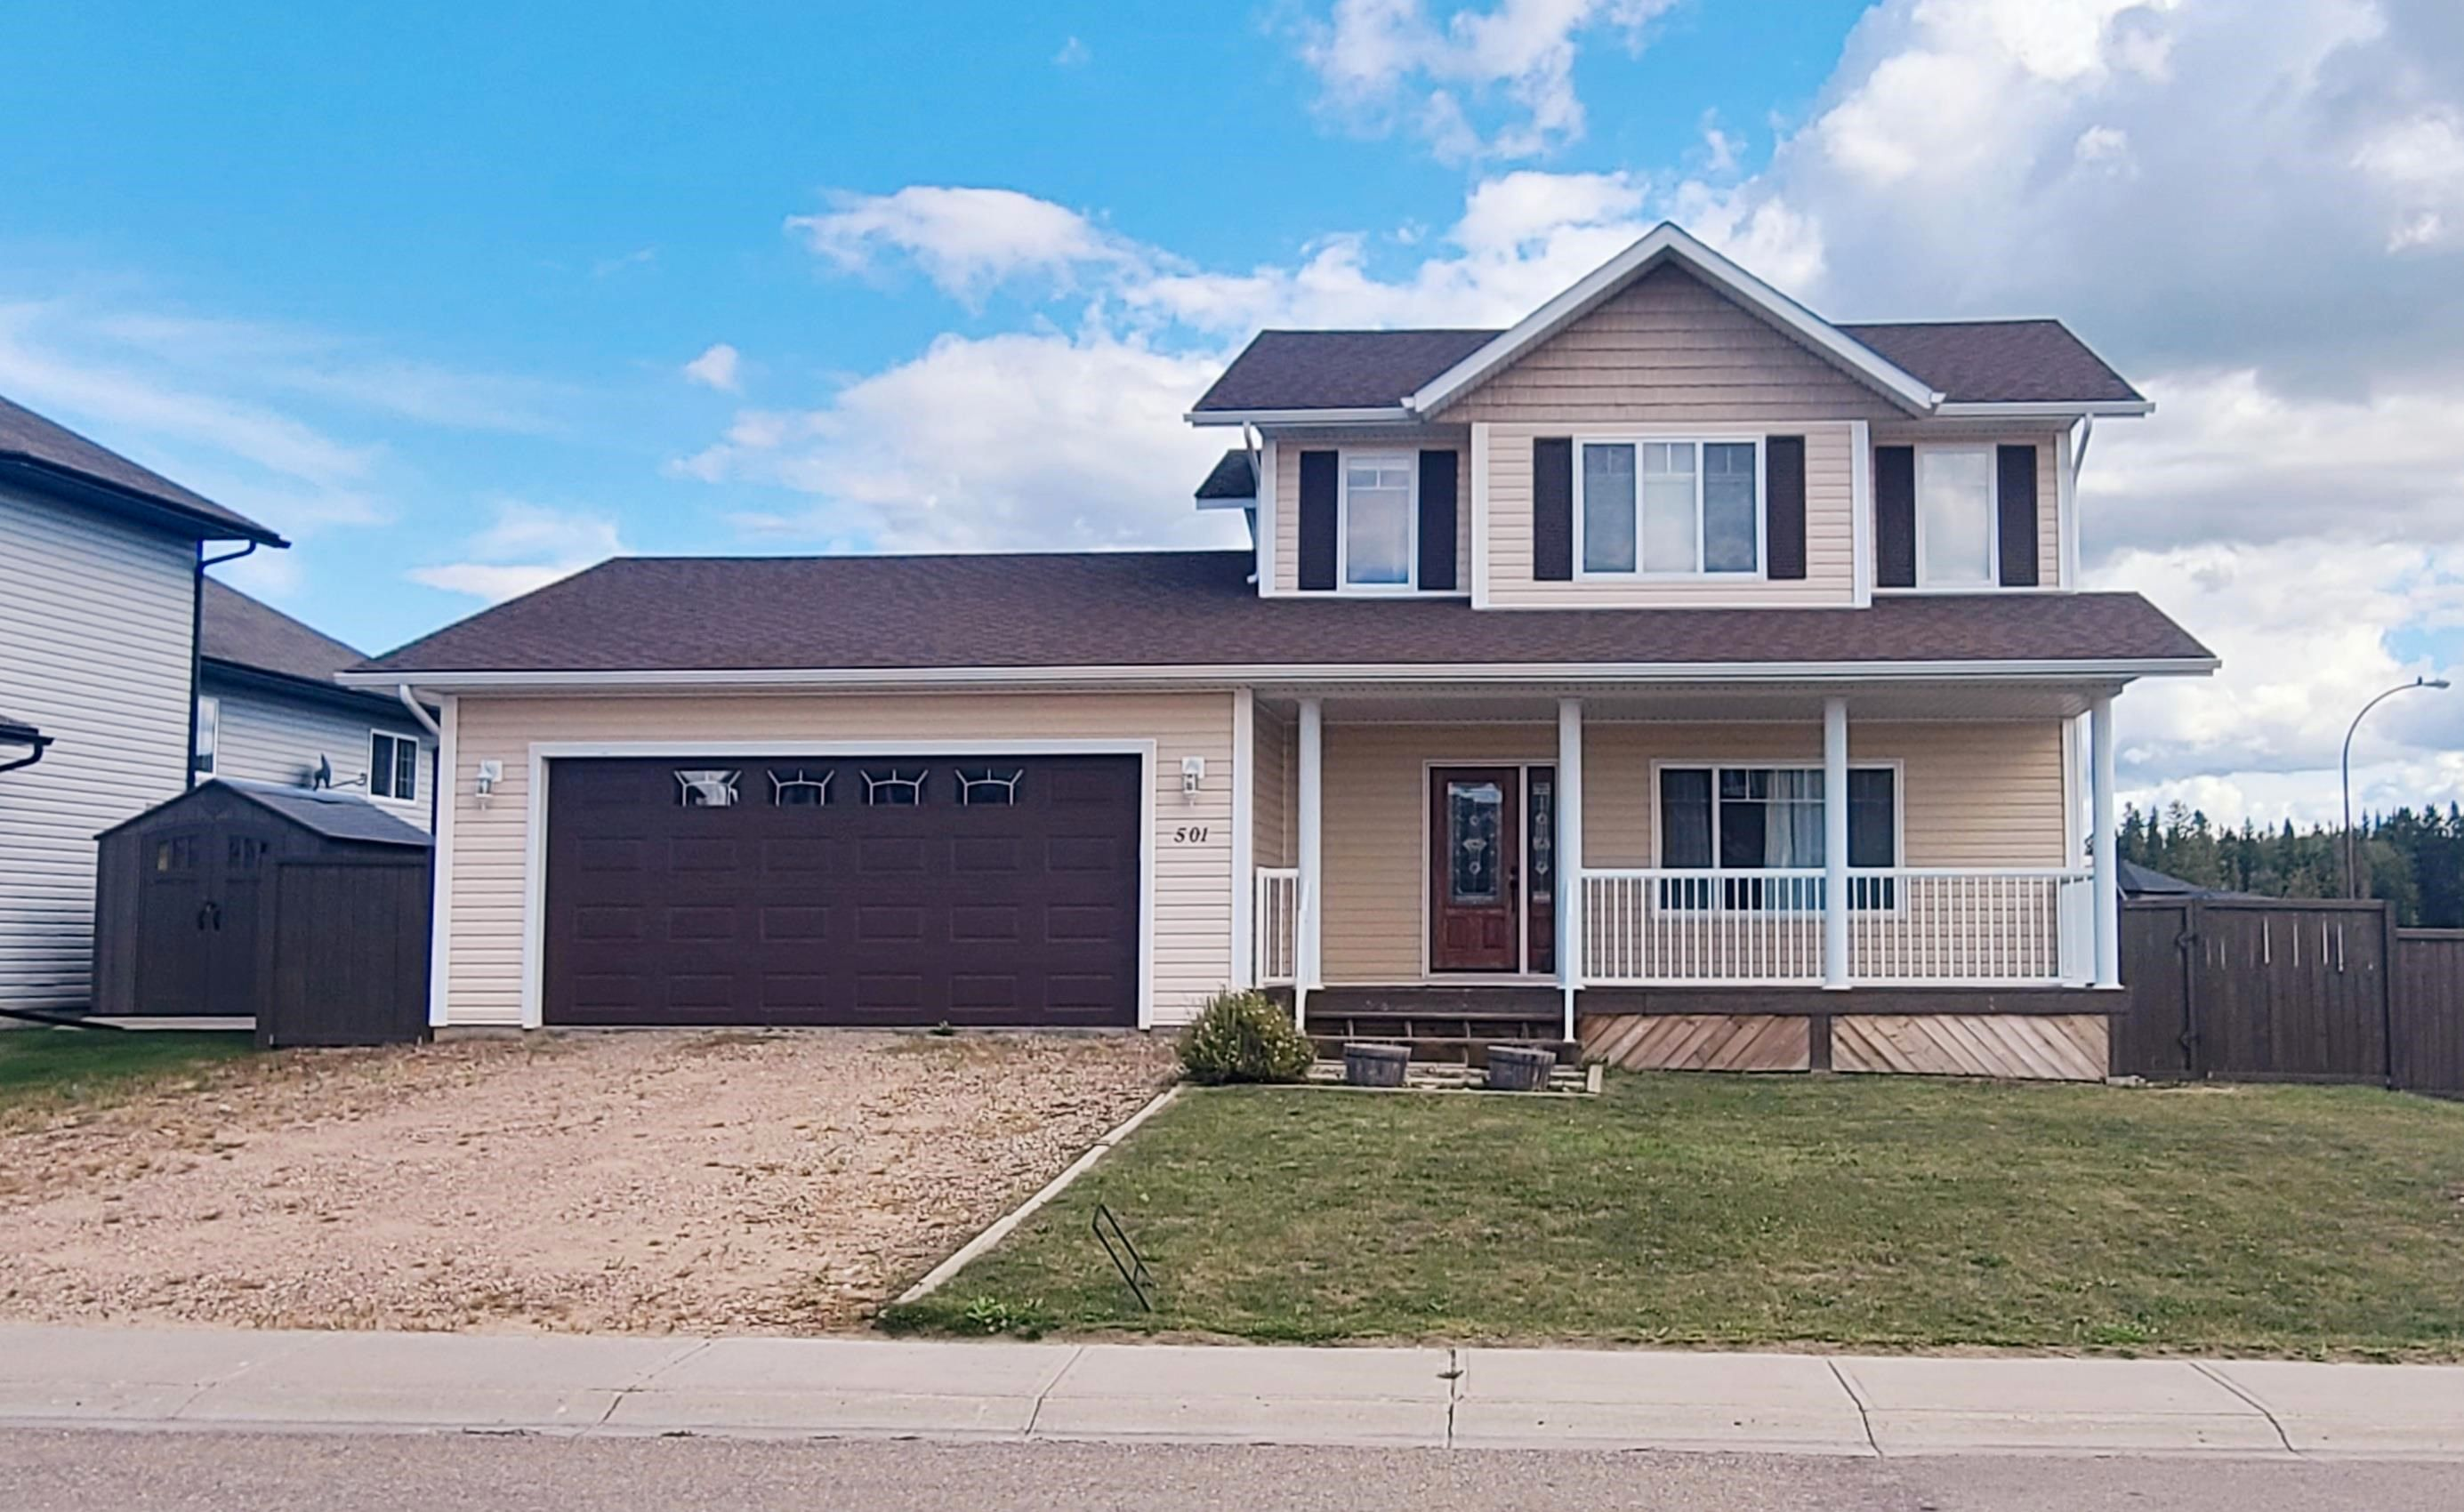 Main Photo: 501 26 Street: Cold Lake House for sale : MLS®# E4258696